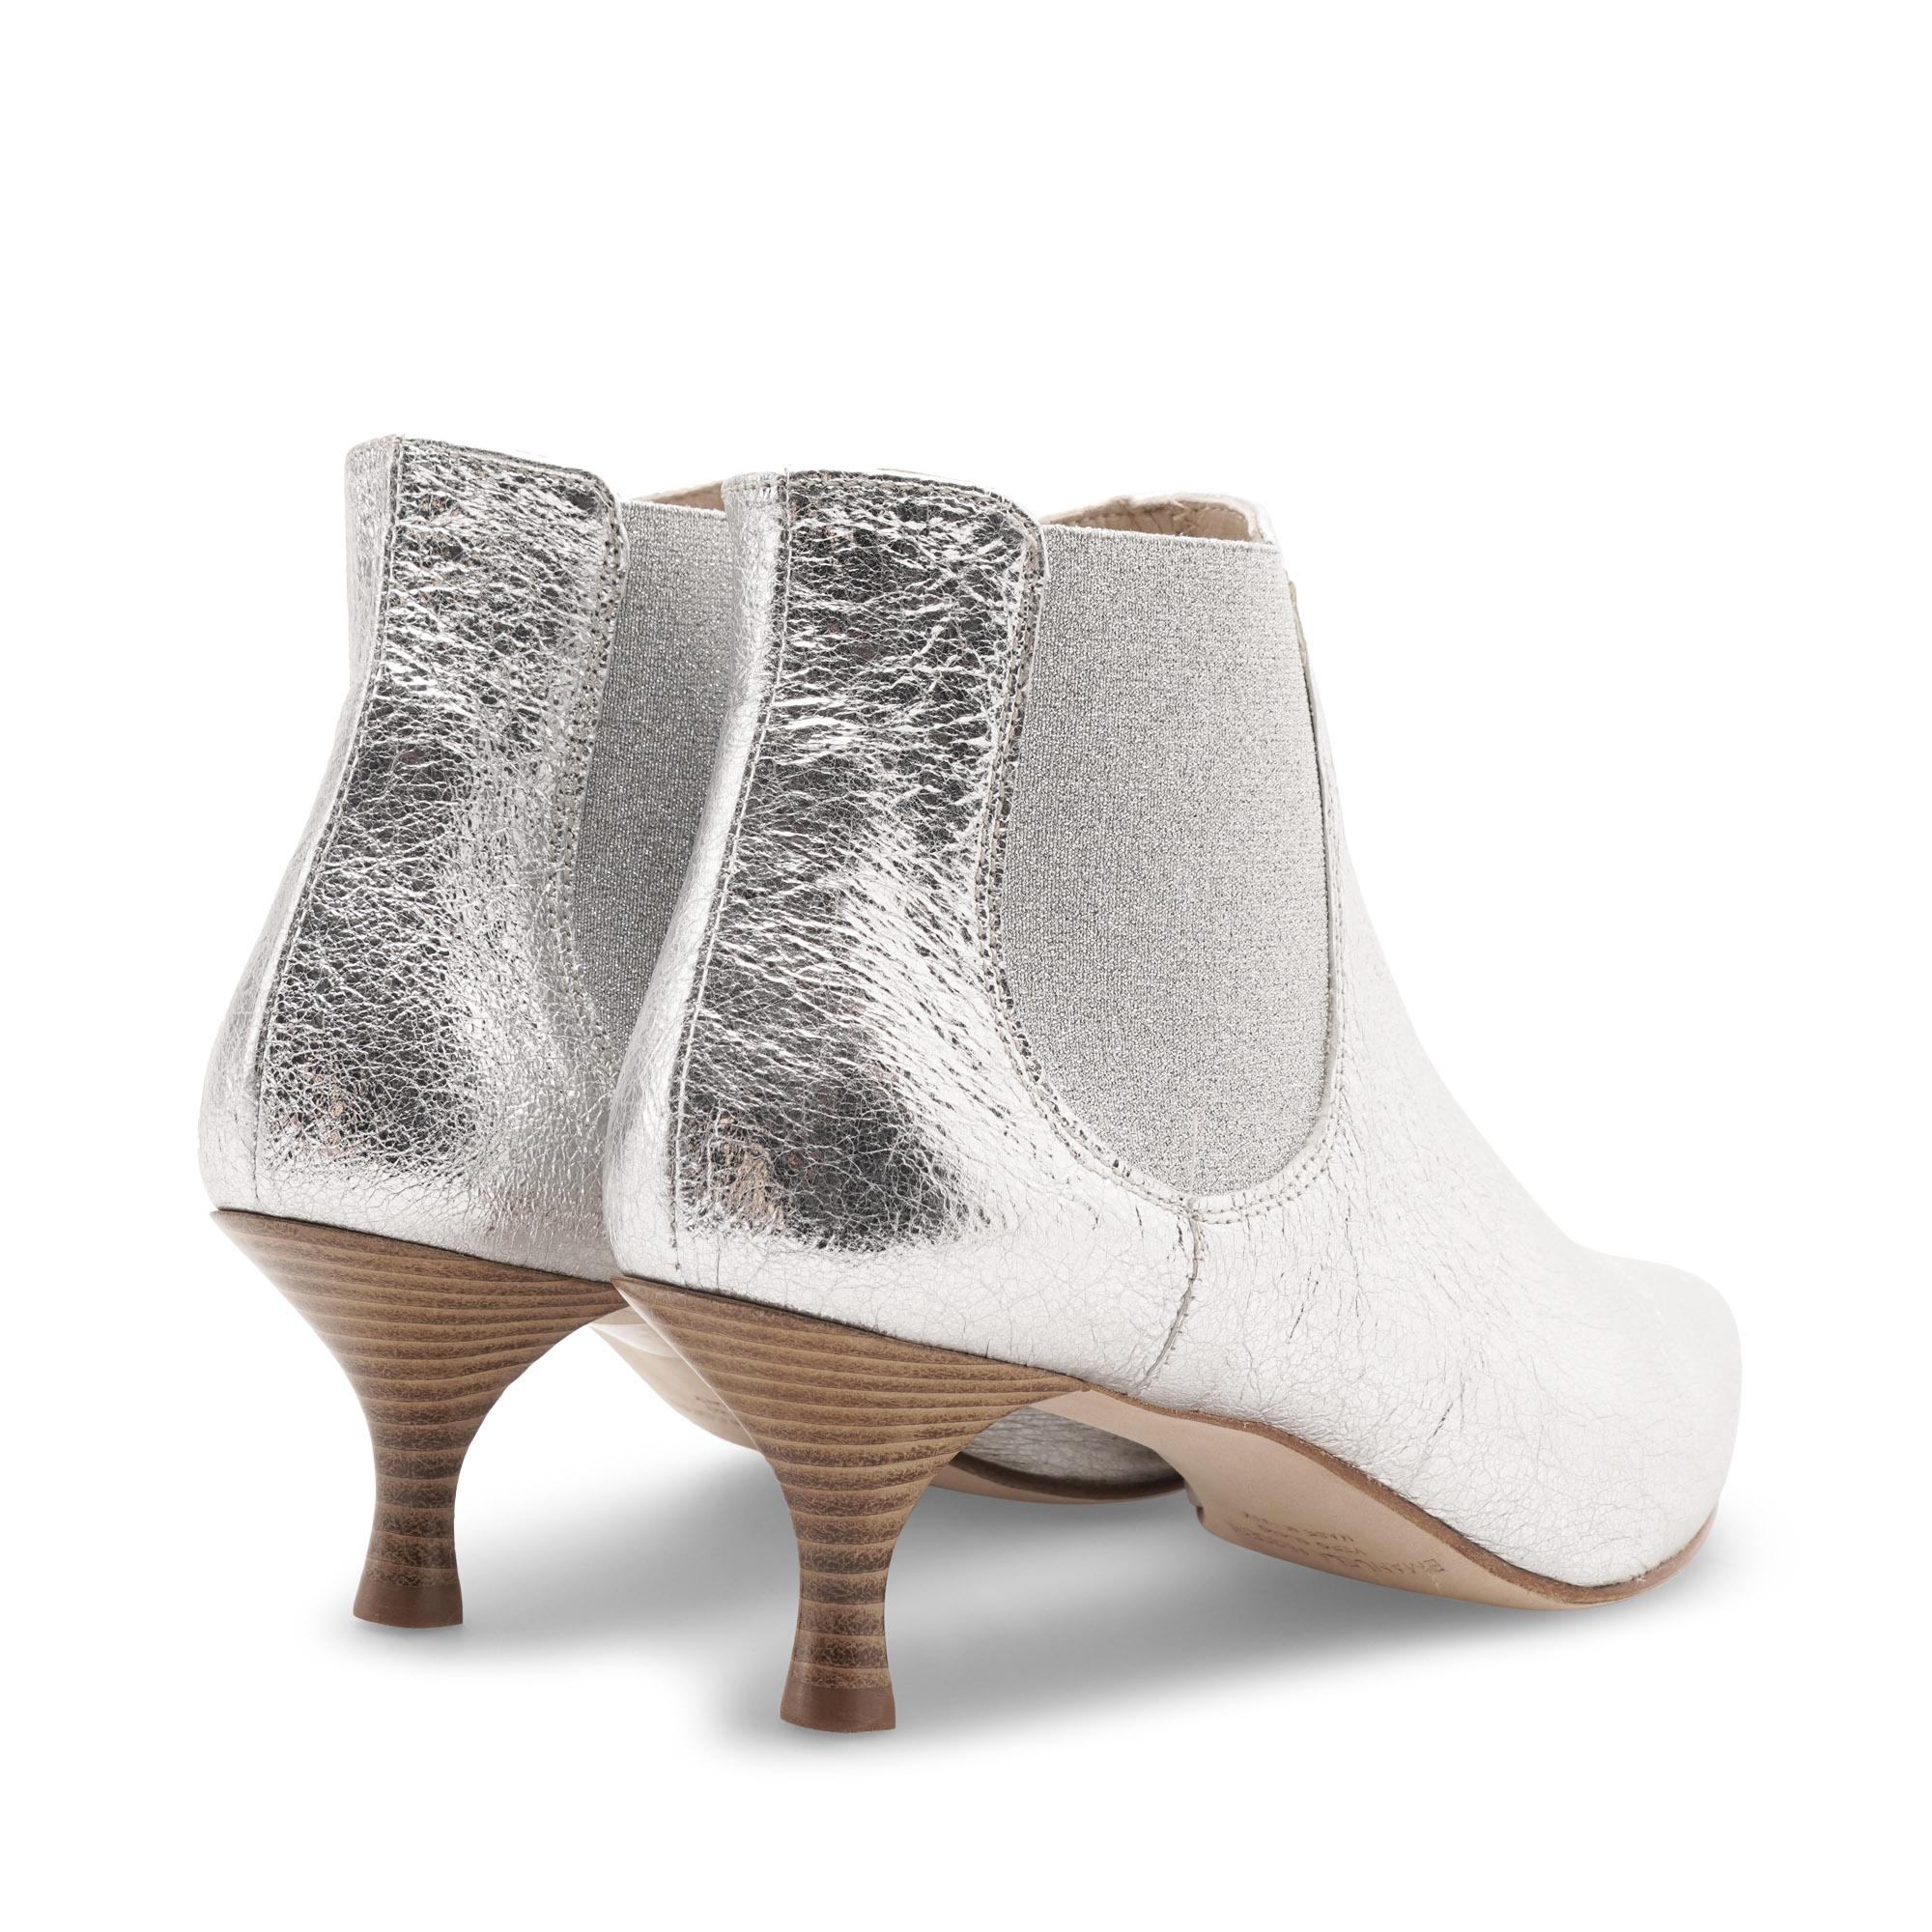 tronchetto-stivaletto-laminato-argento-emanuela-passeri-shoes-heels-spring-summer-2021